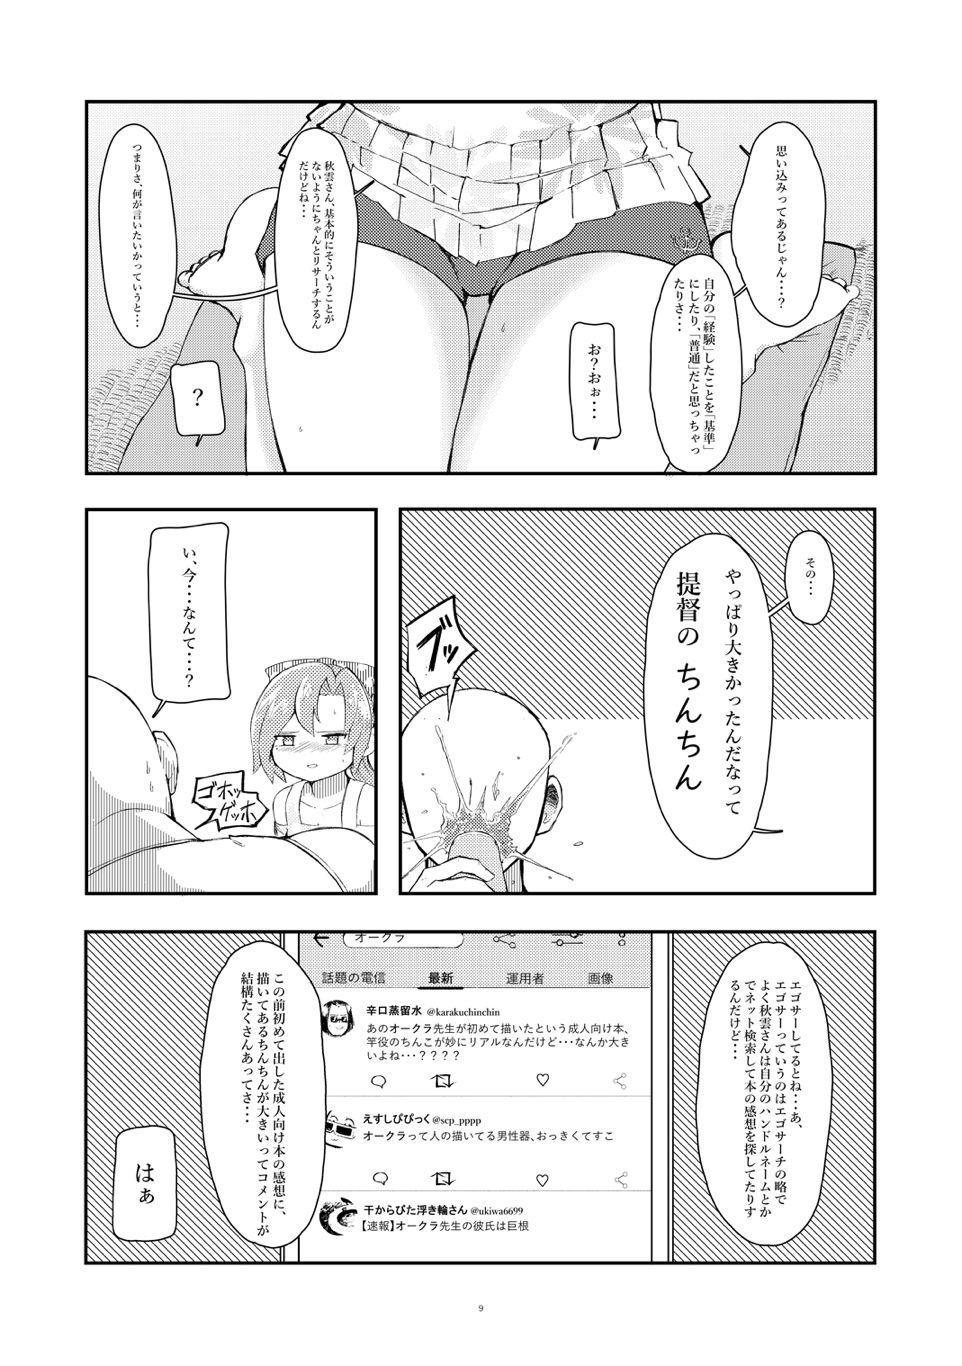 Hoshiwasure Misaki 7